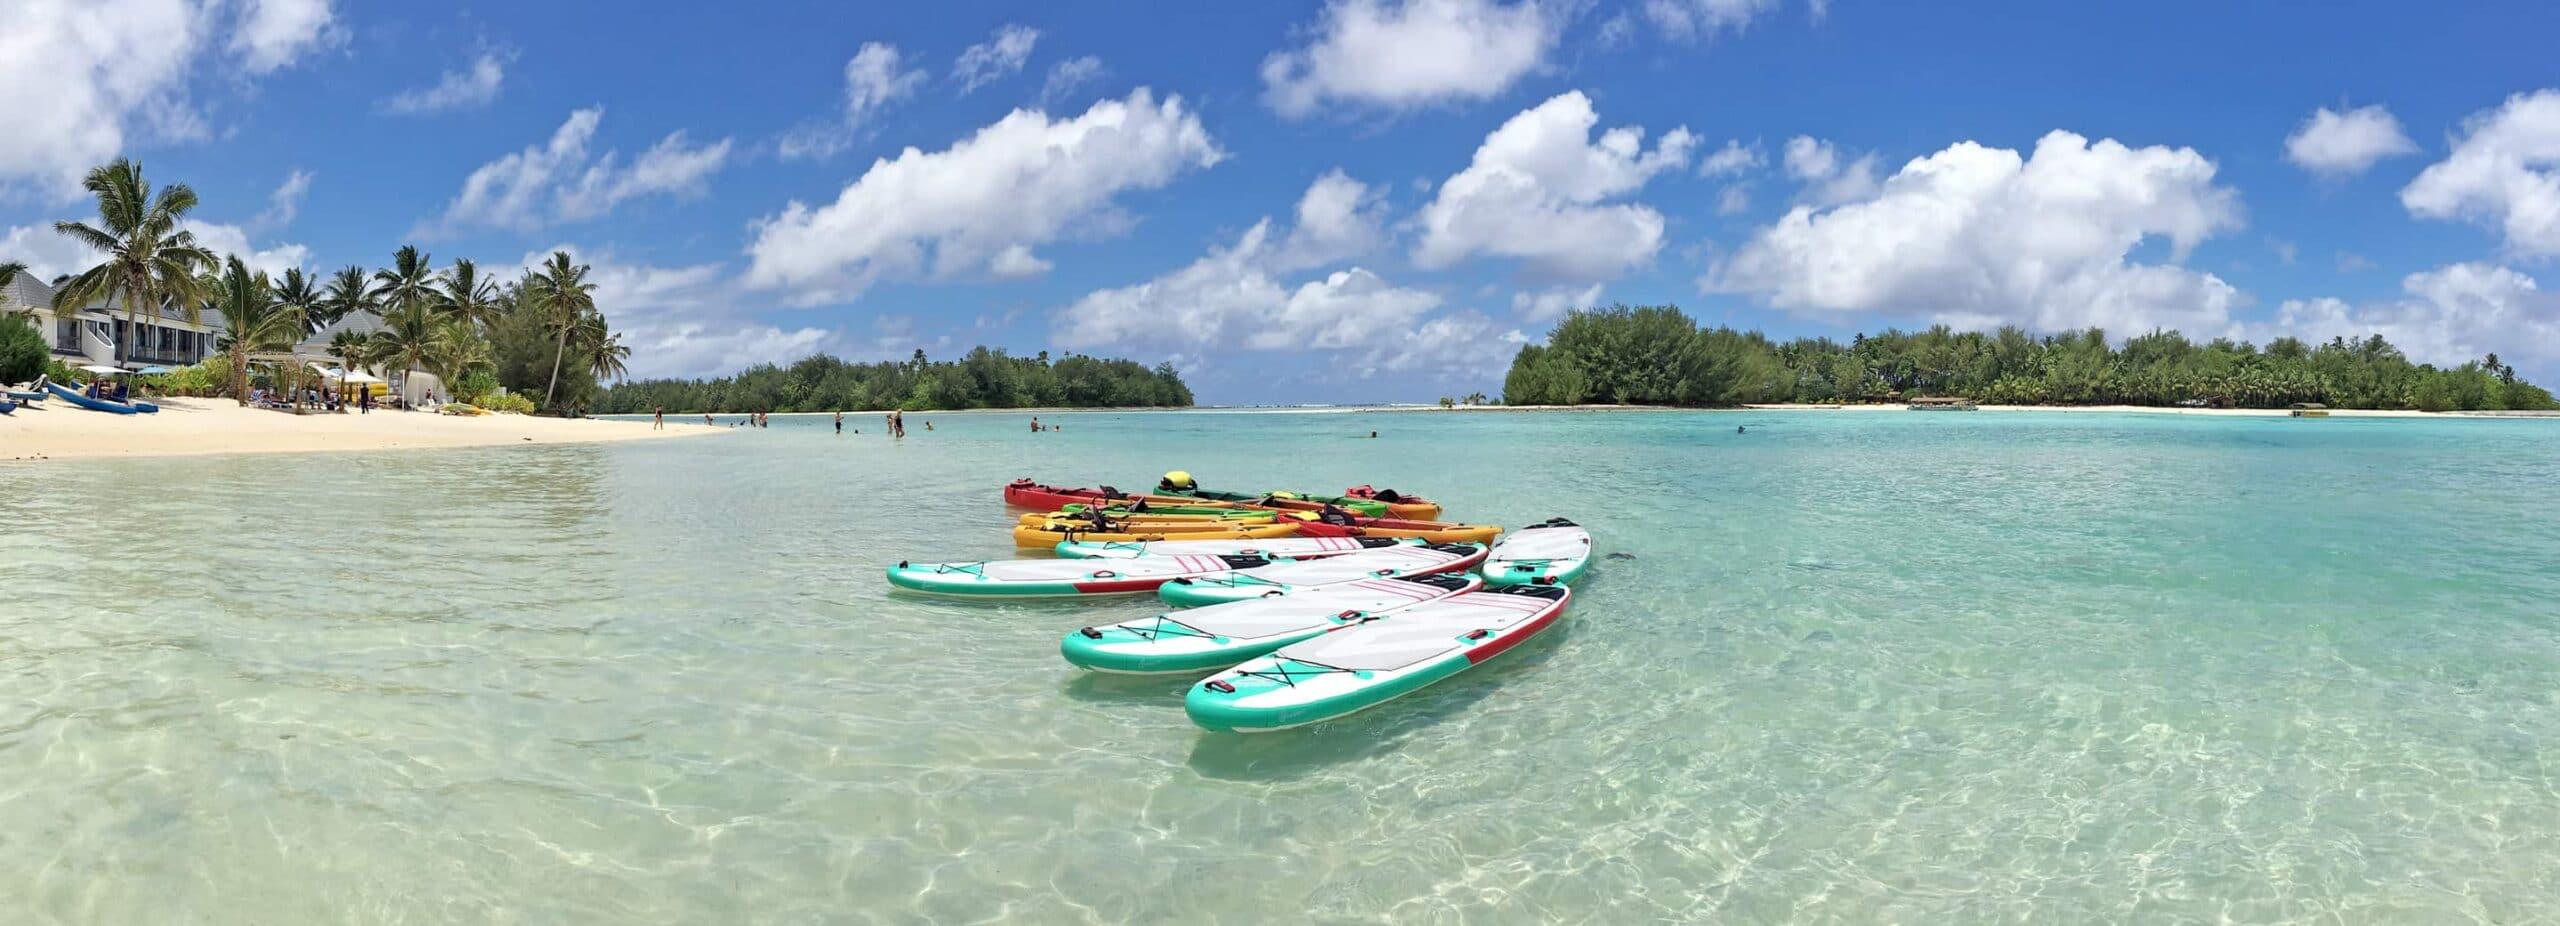 Rarotonga, Den blå lagune, Cook Islands